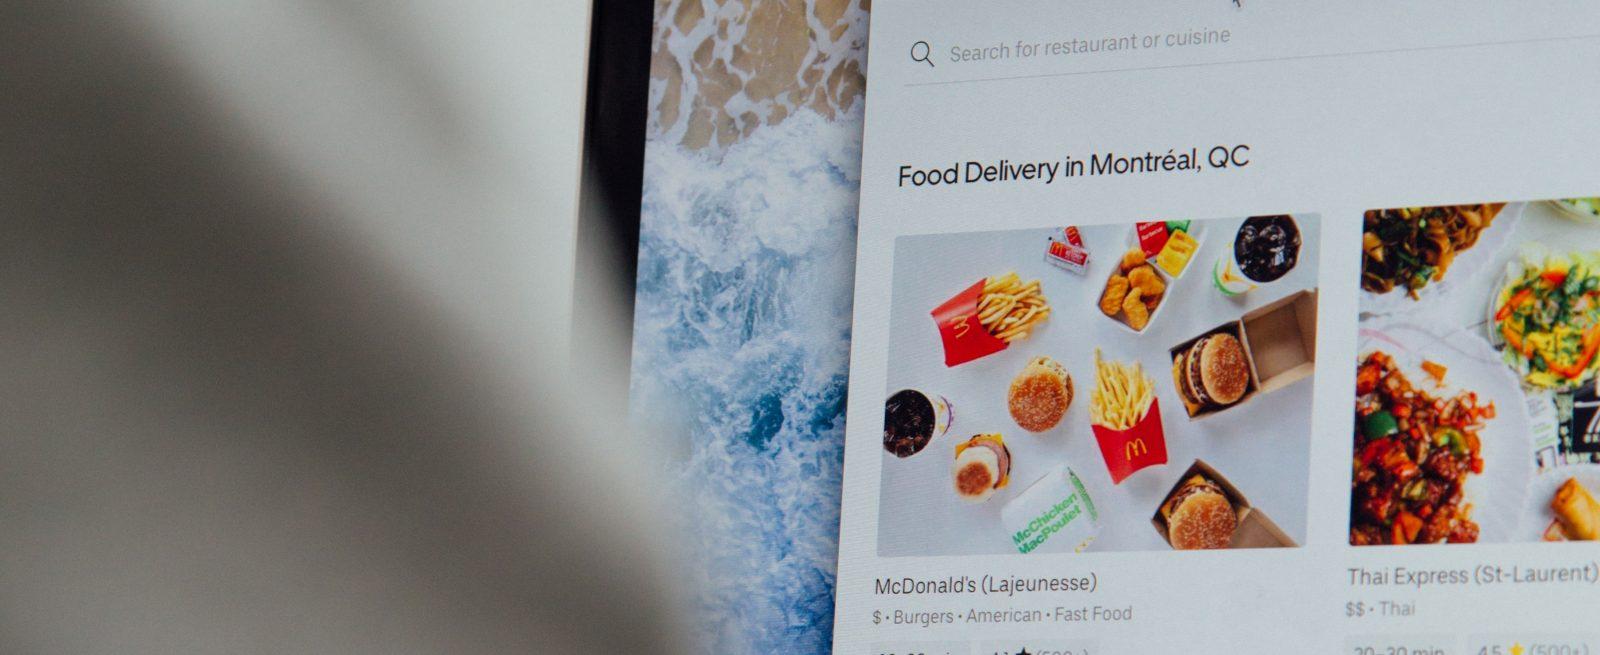 Emerging Trends in Restaurant Takeout   Modern Restaurant Management   The Business of Eating & Restaurant Management News